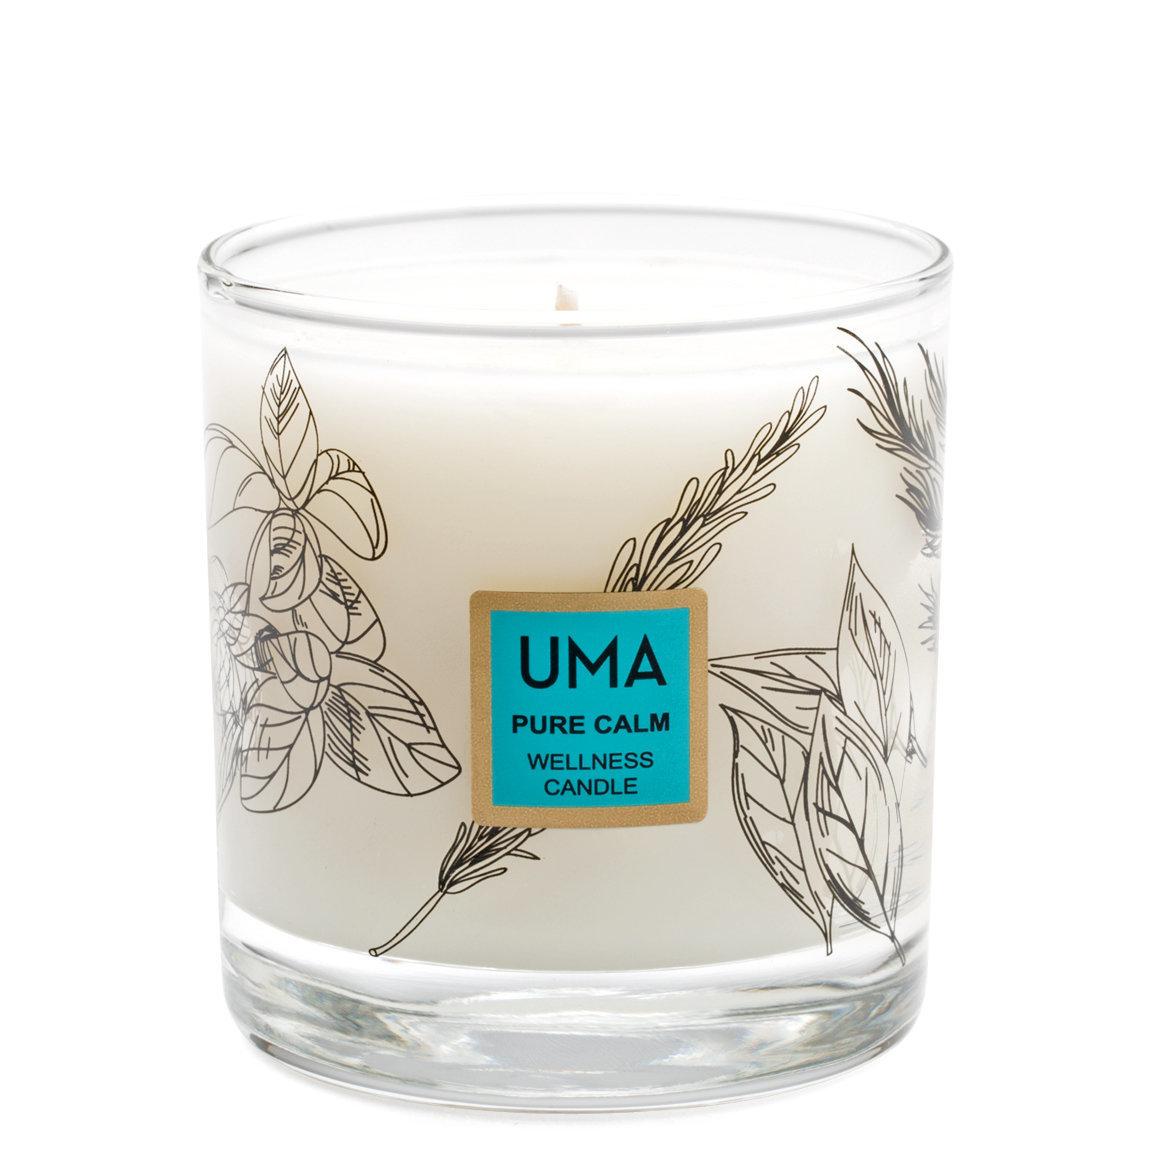 Uma Pure Calm Wellness Candle product swatch.